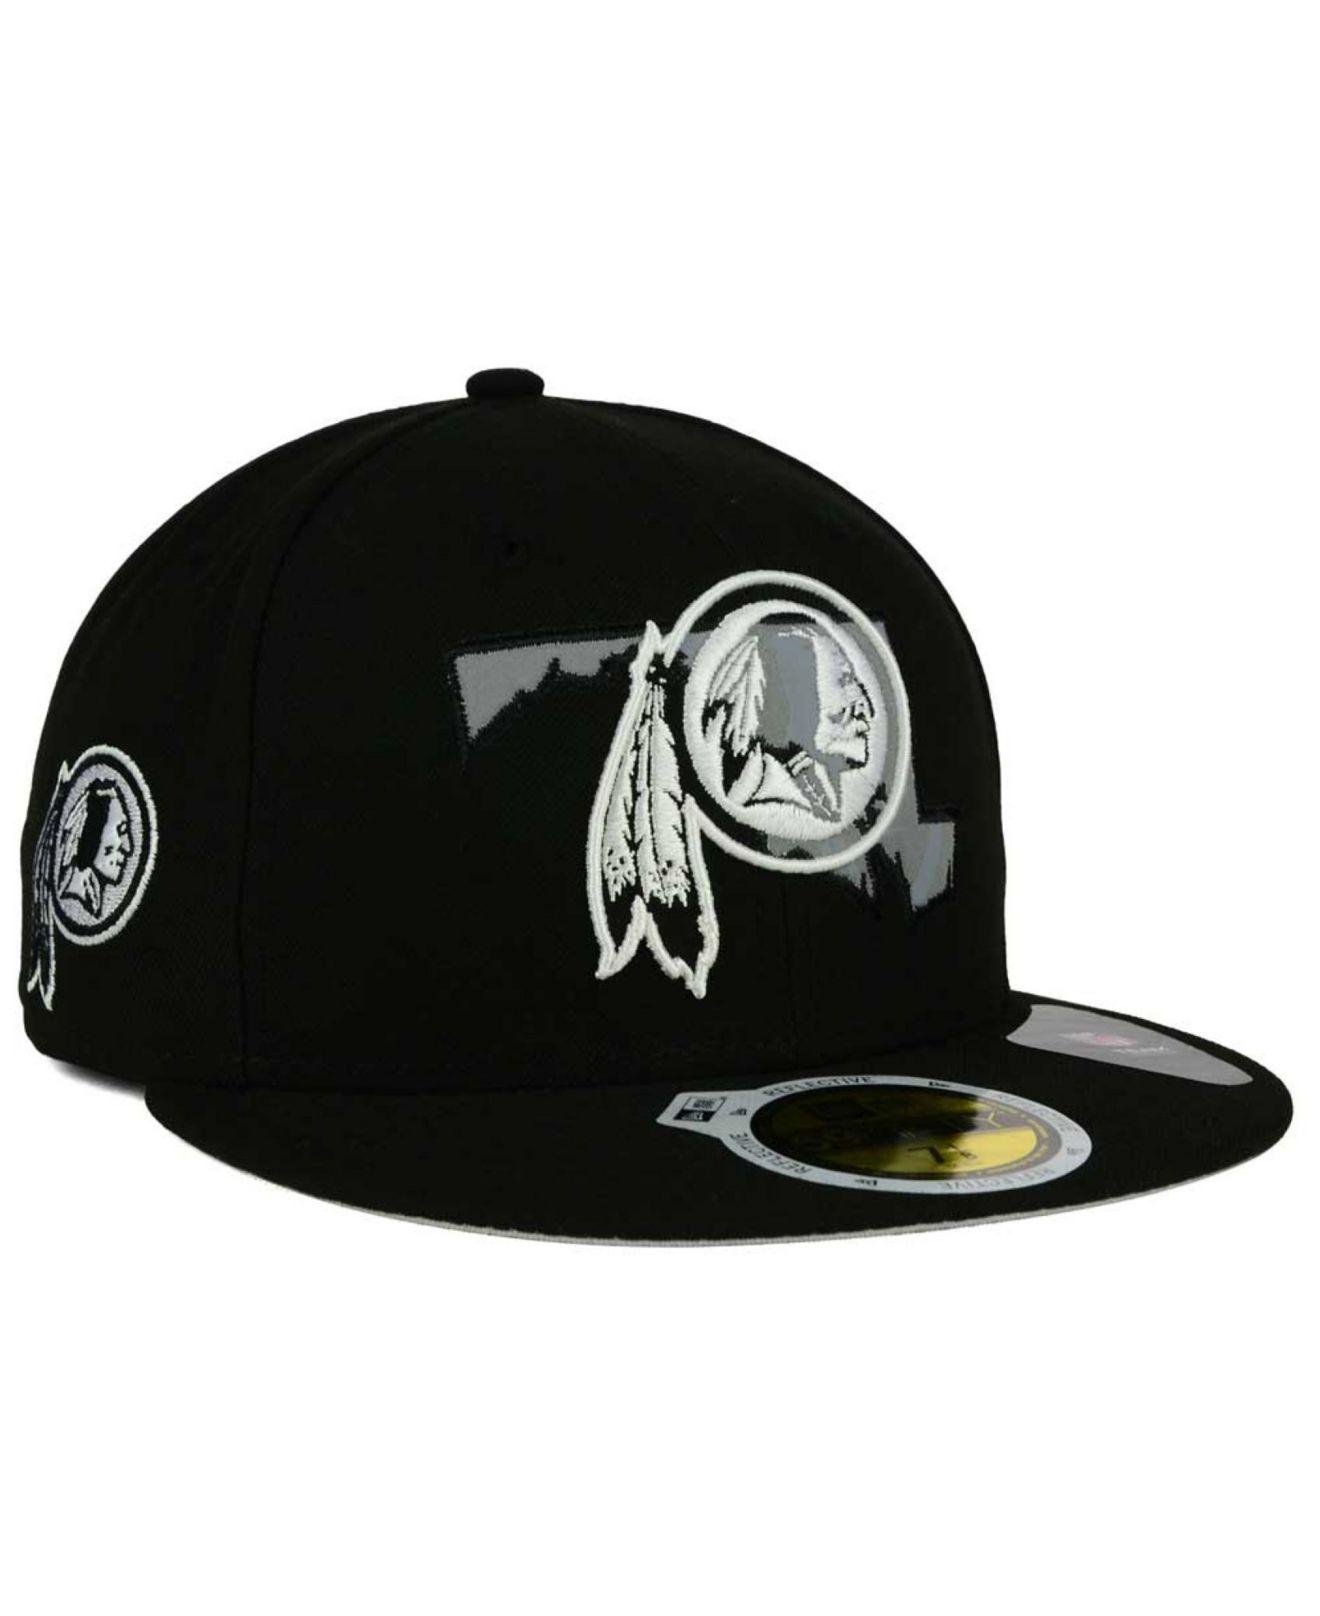 premium selection dcbd5 e491e KTZ Washington Redskins State Flective Redux 59fifty Cap in Black ...